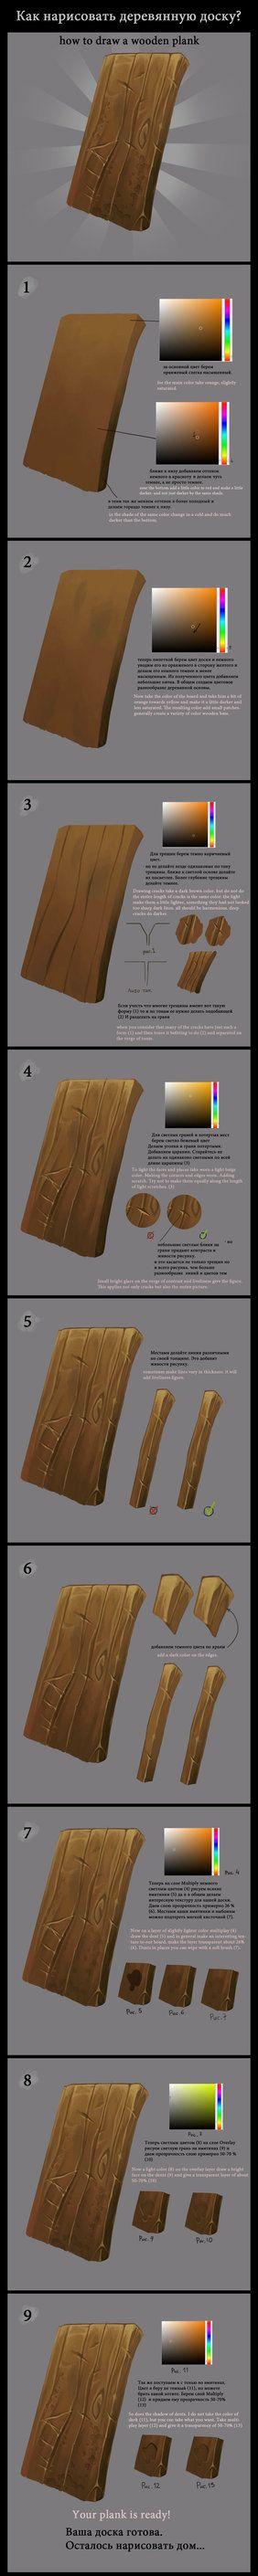 How to draw wooden plank? by ~Gimaldinov on deviantART